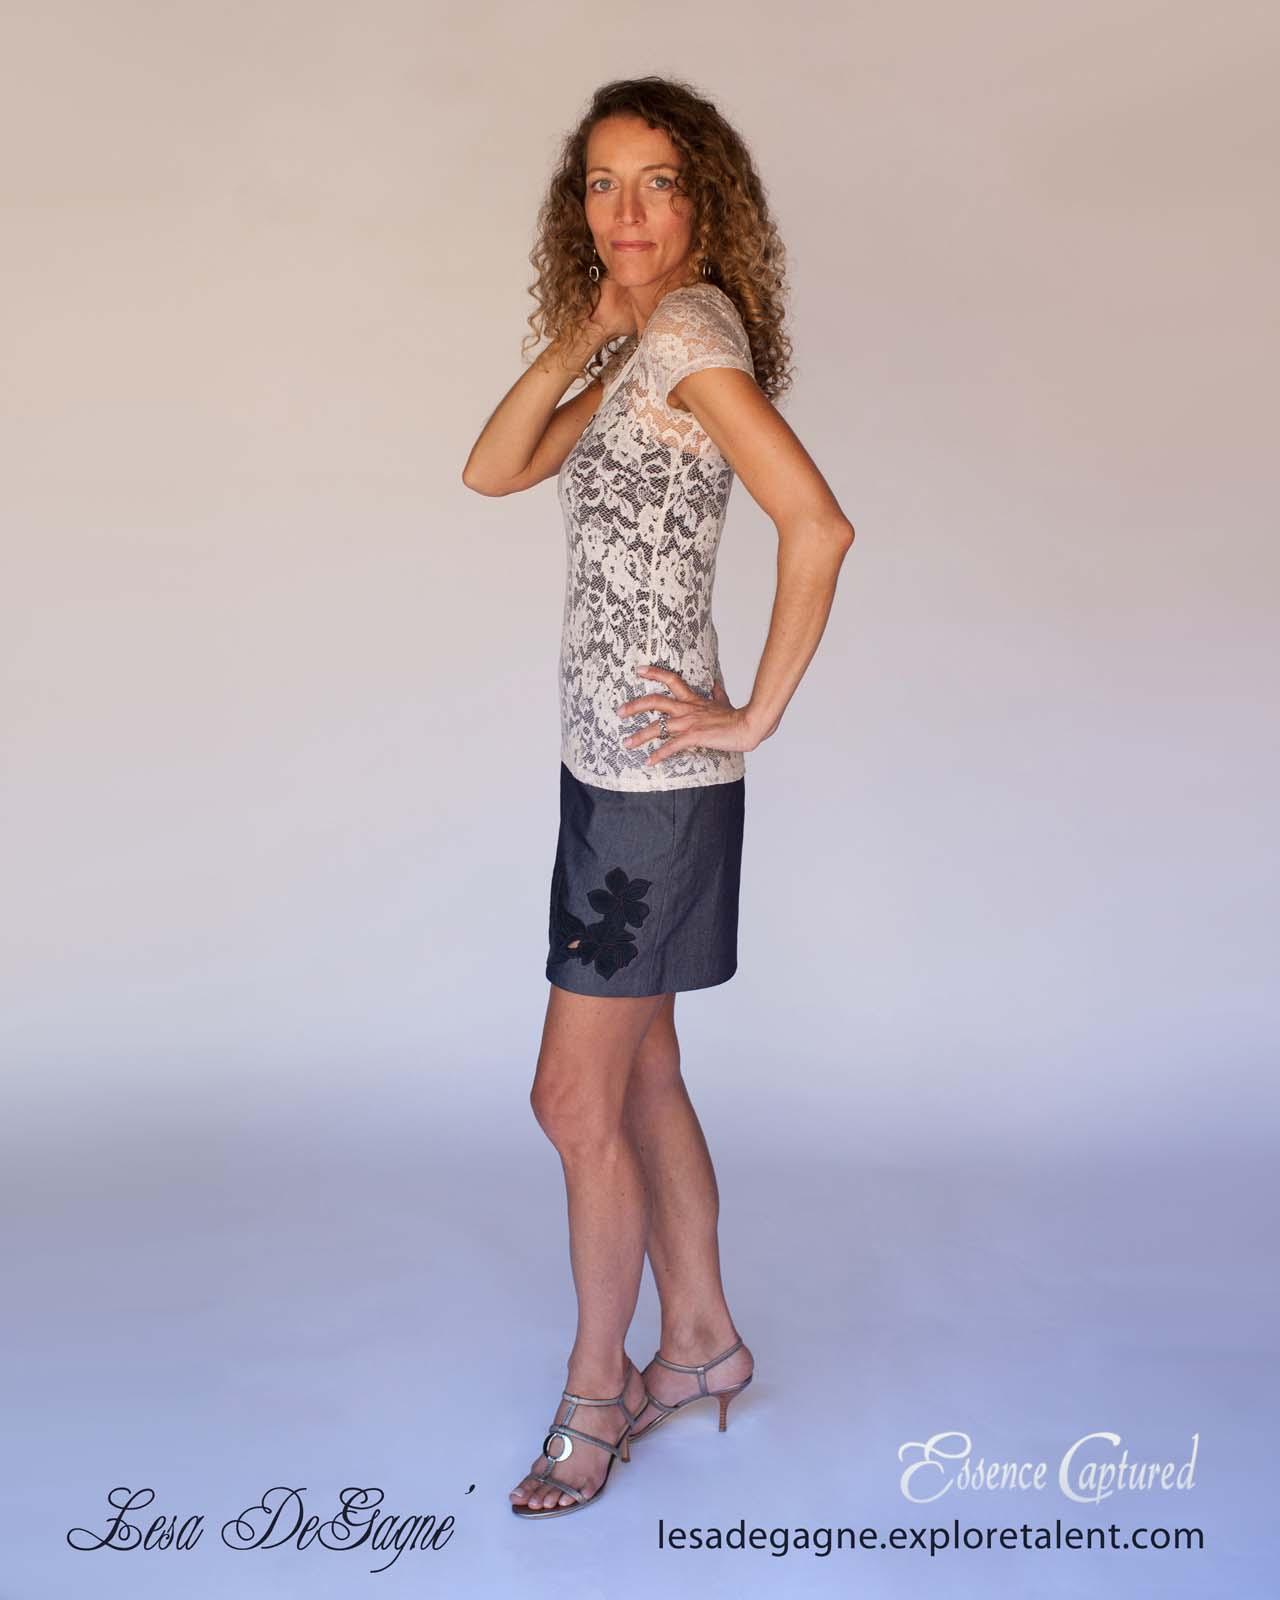 model book body shot female mid 40s